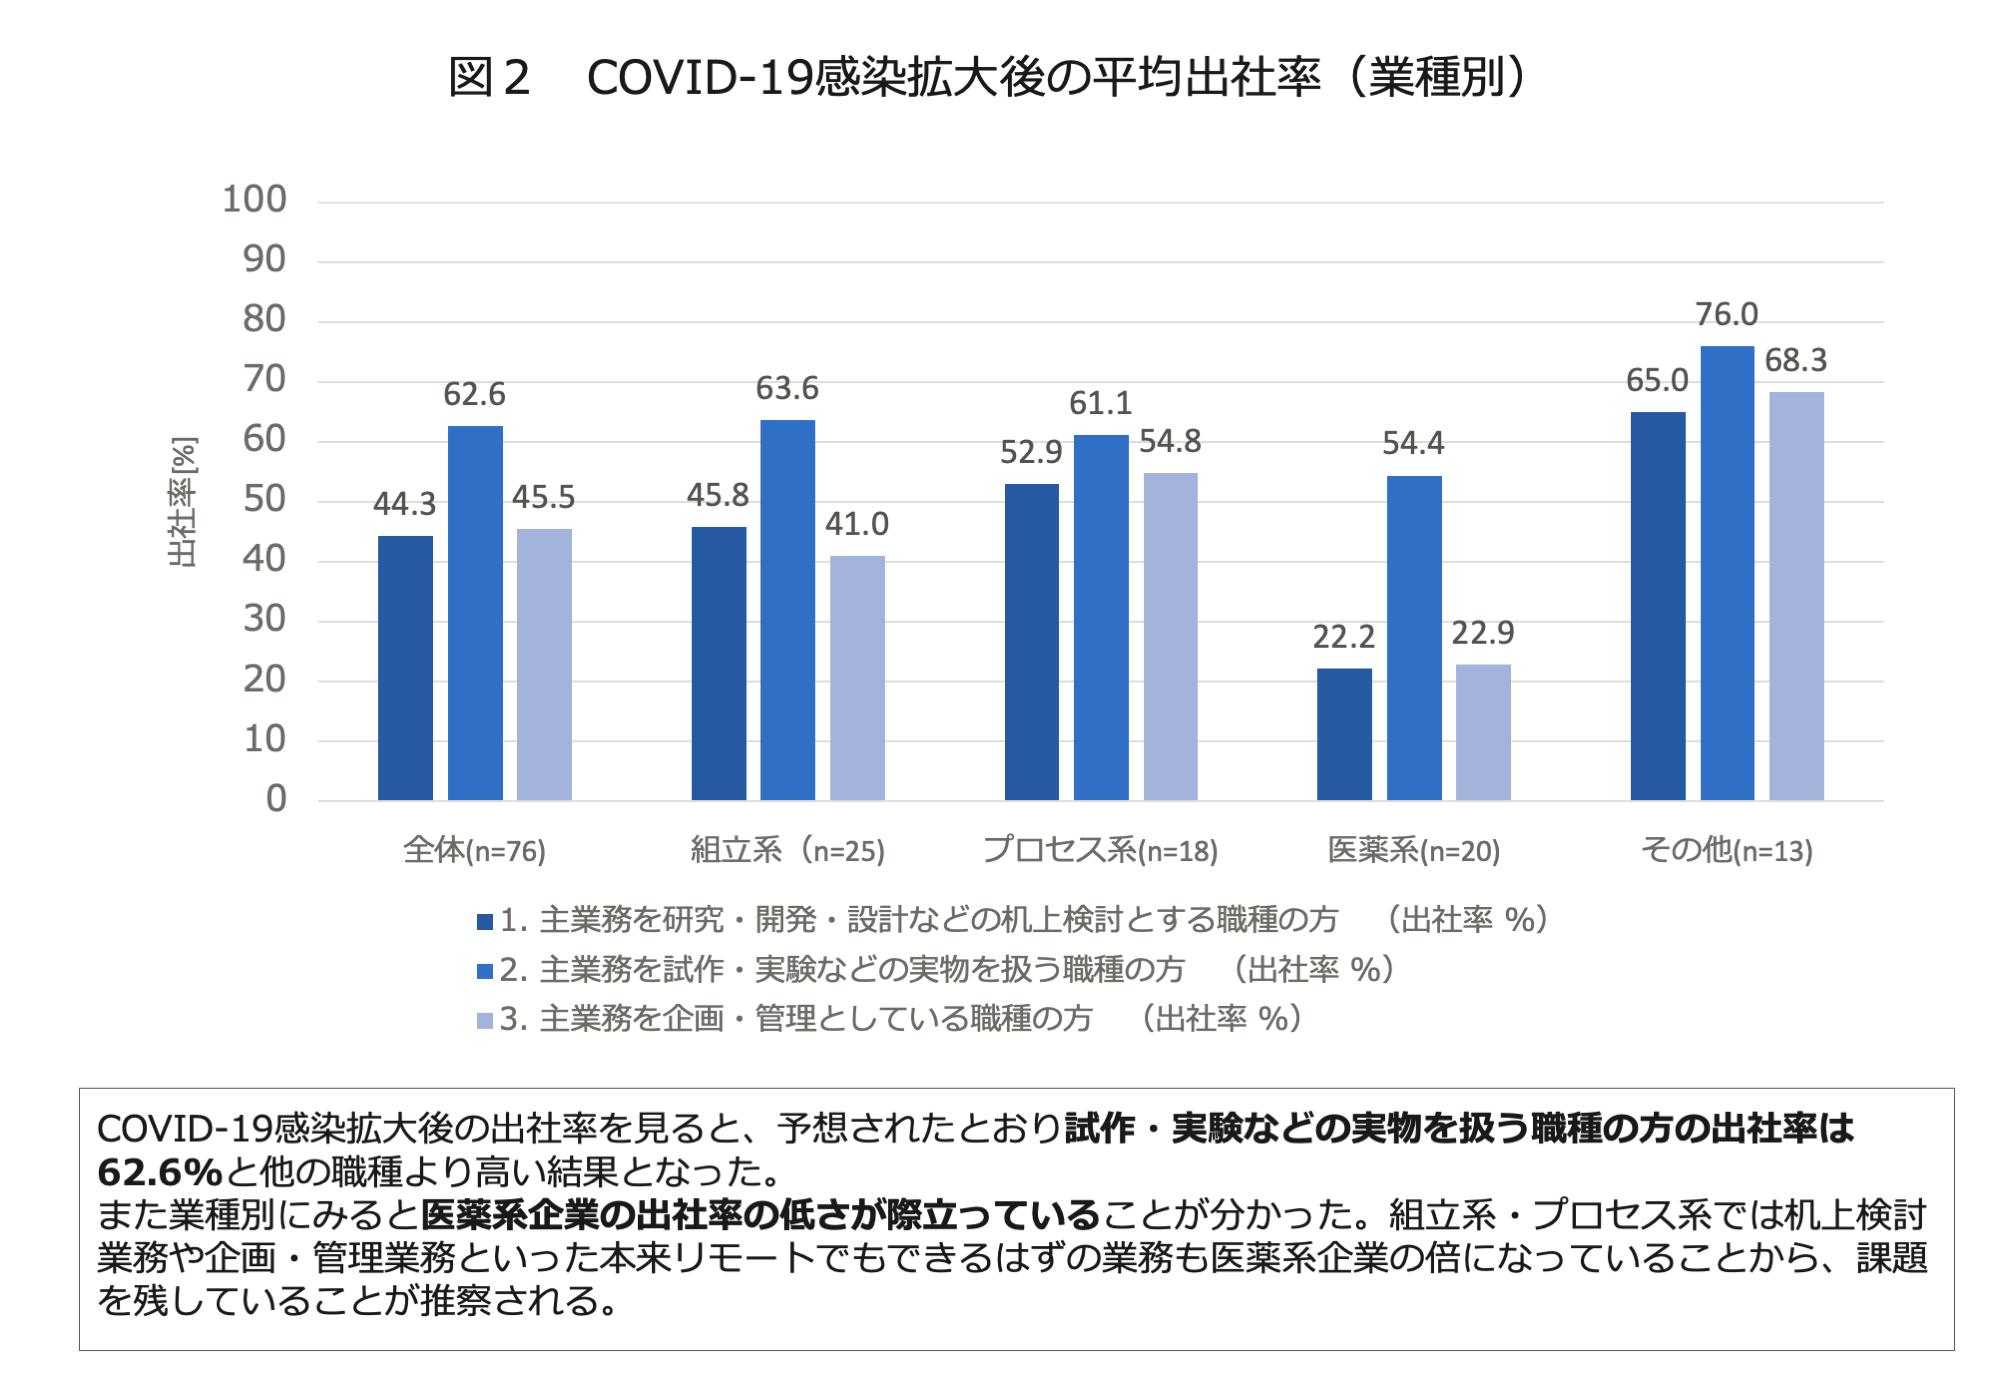 図2 COVID-19感染拡大後の平均出社率(業種別)